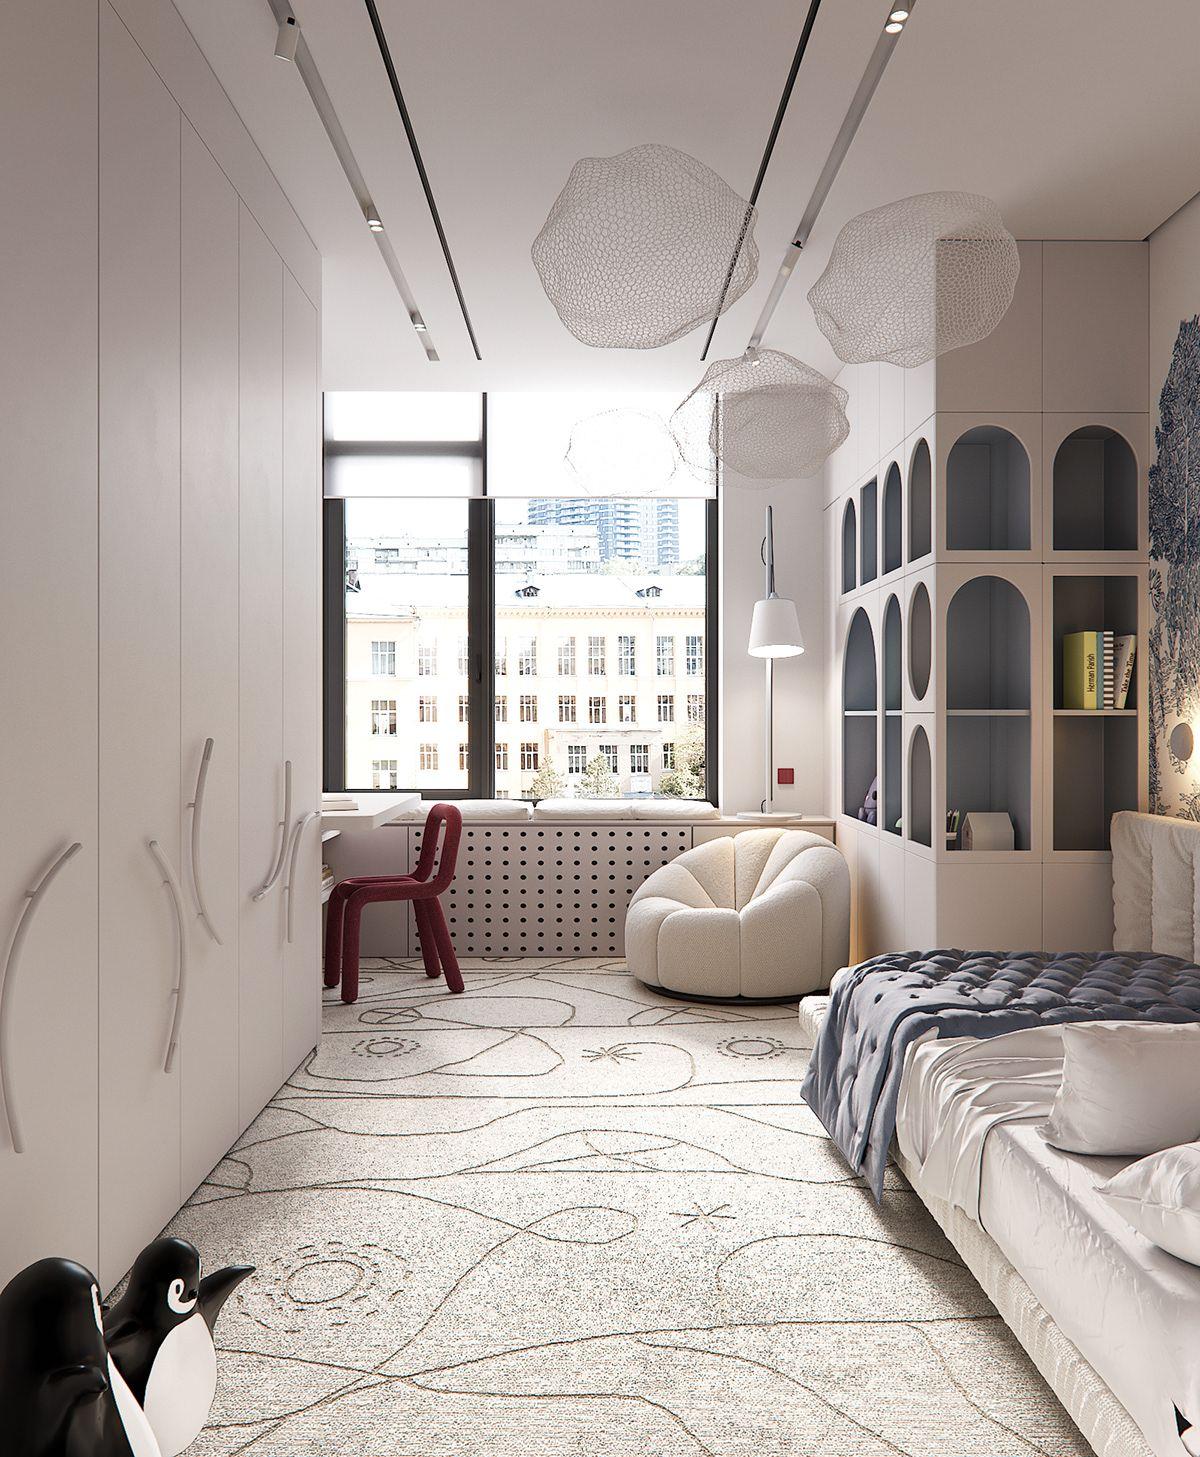 Silence Among The Noise On Behance Kids Interior Room Kids Bedroom Inspiration Luxury Kids Bedroom Interior room design images